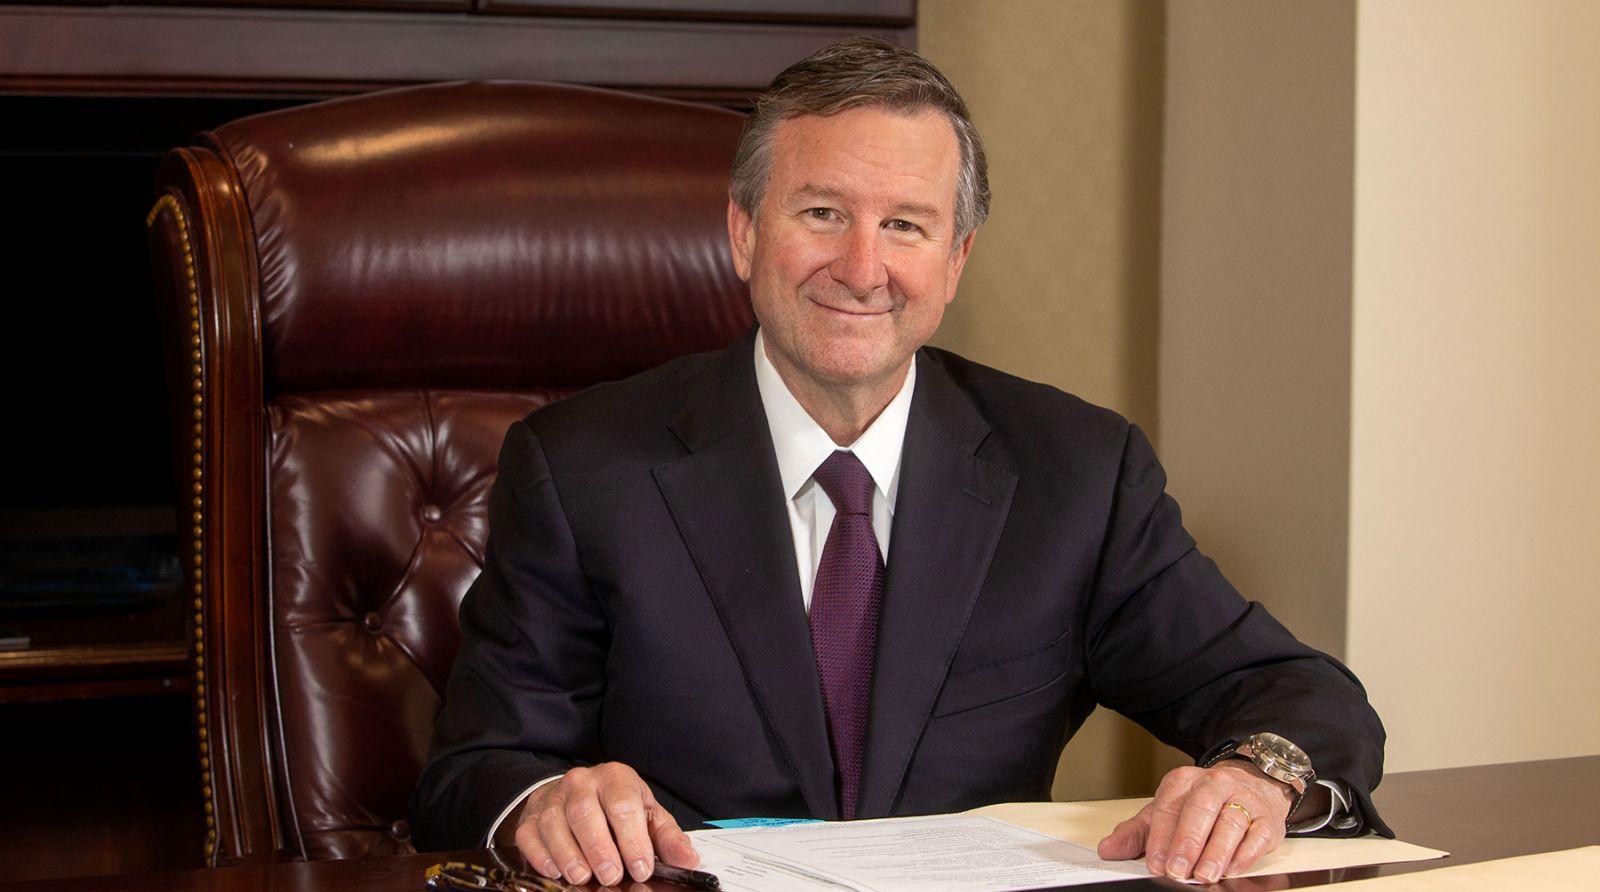 President McCullough